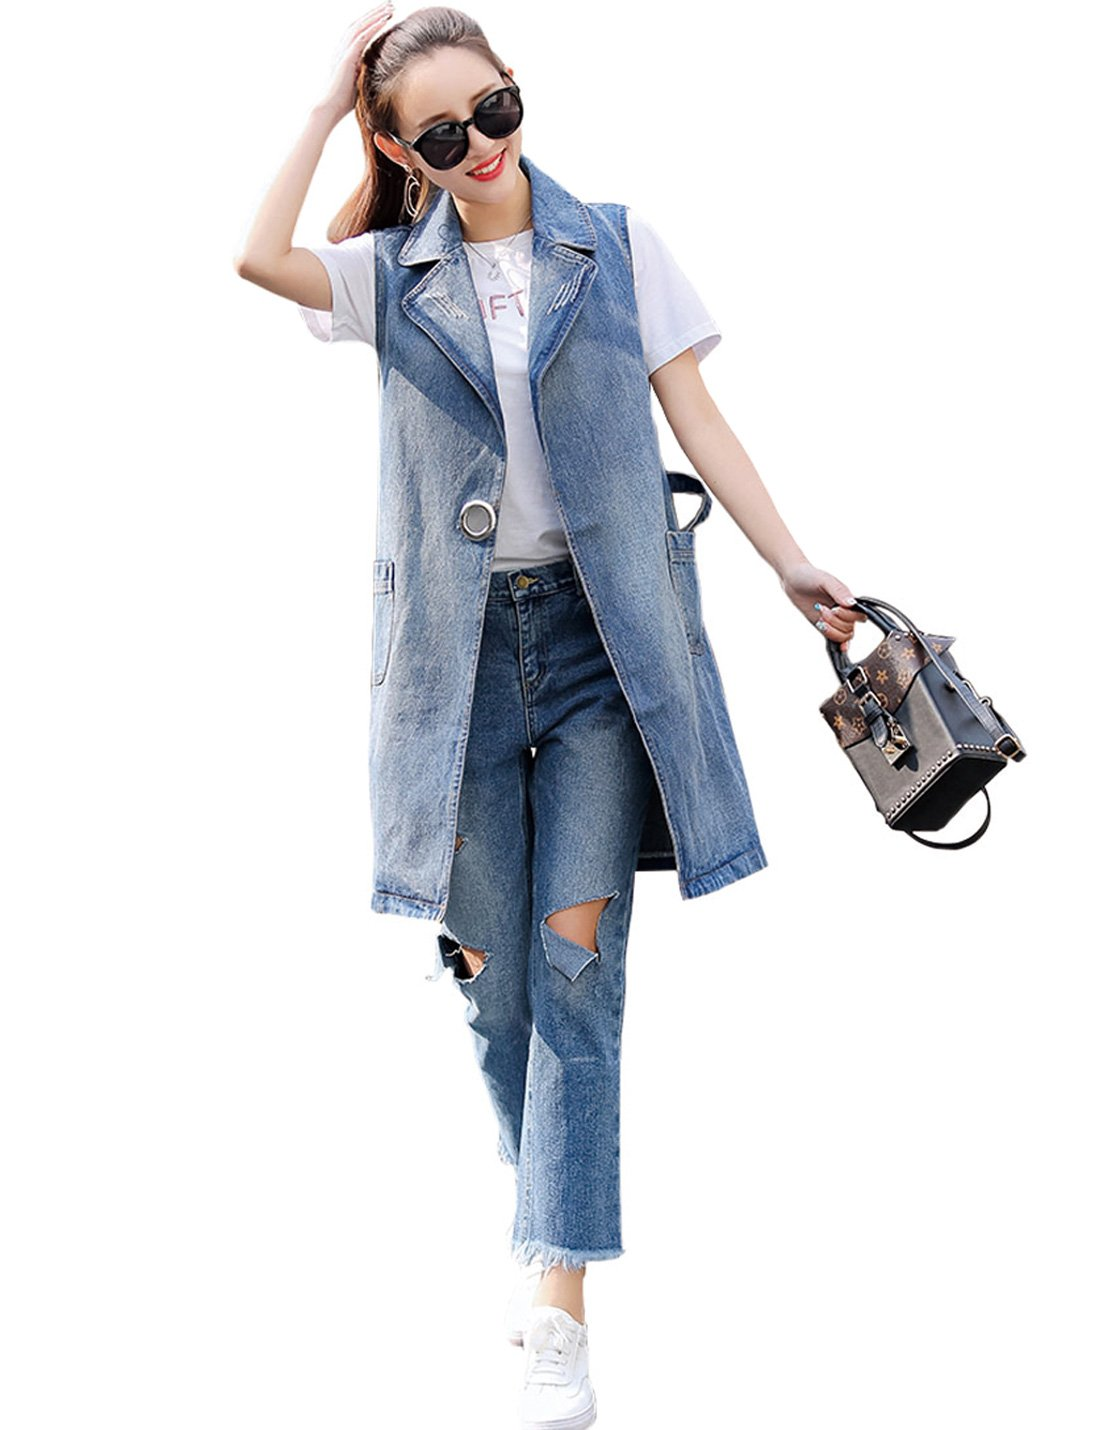 Jenkoon Women's Casual Denim Waistcoat Vest Sleeveless Coat Long Jean Tops with Turn Down Collar (Blue, Medium)